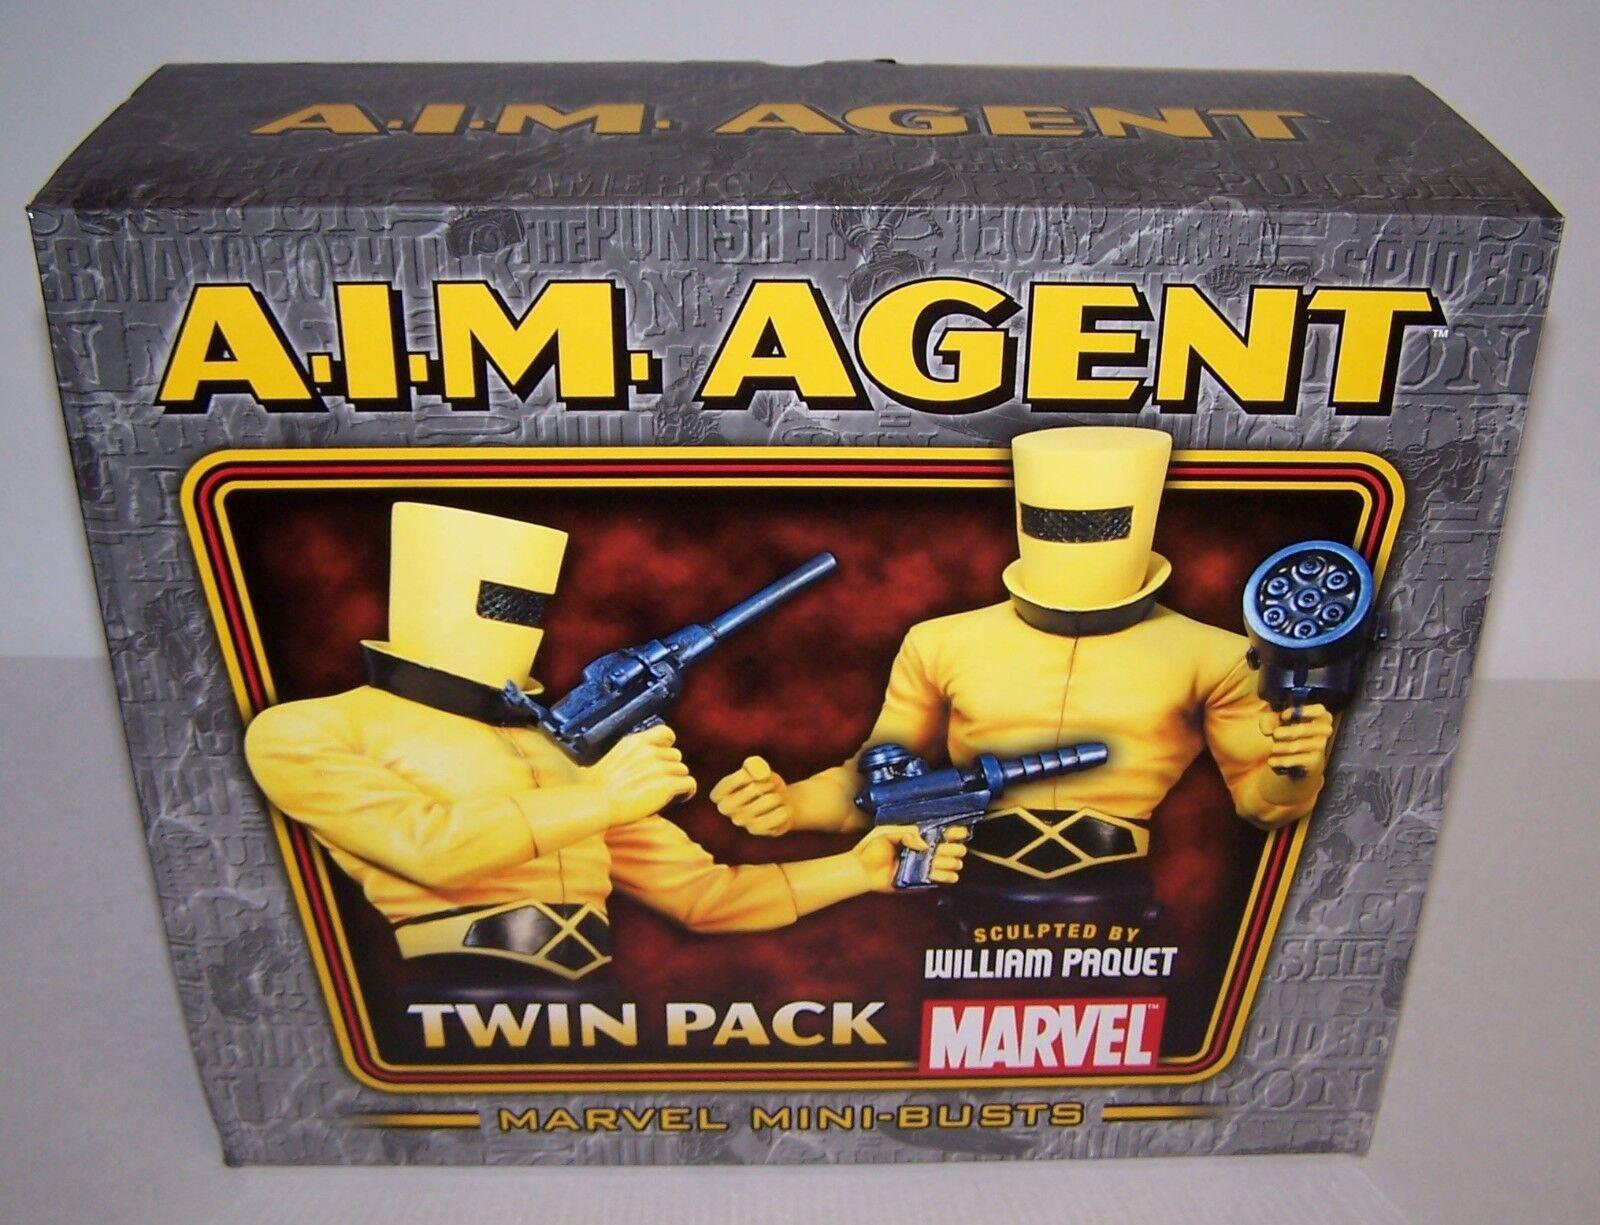 A.I.M. agente Twin Pack Marvel 6  mini-bustos Bowen Designs  1500 Nuevo En Caja